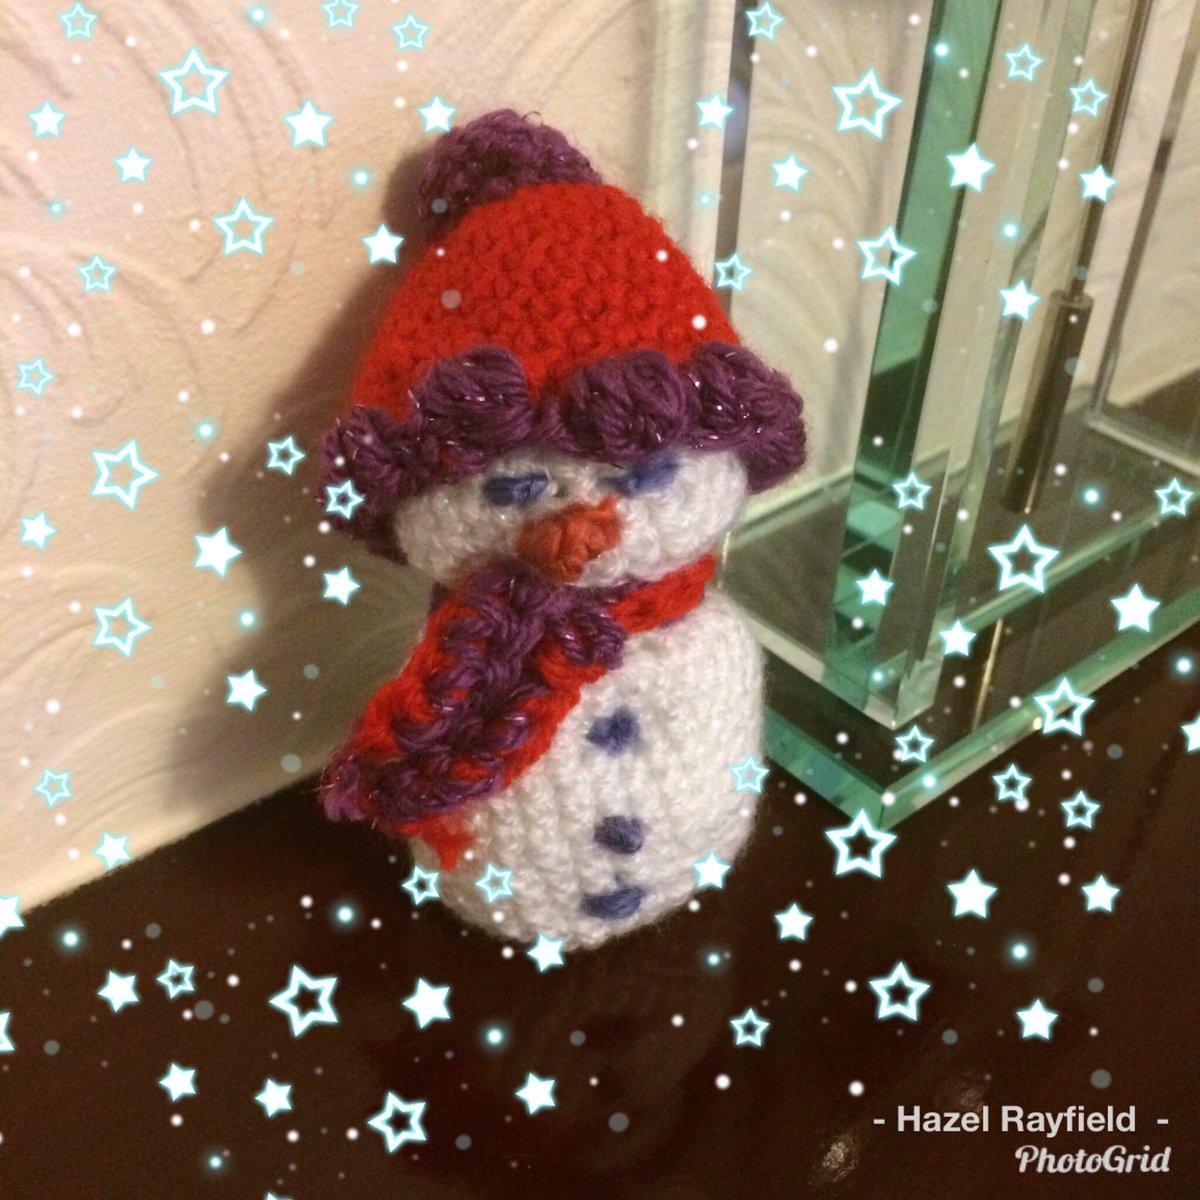 Hazel Rayfield On Twitter Not A Painting But A Miniature Snowman